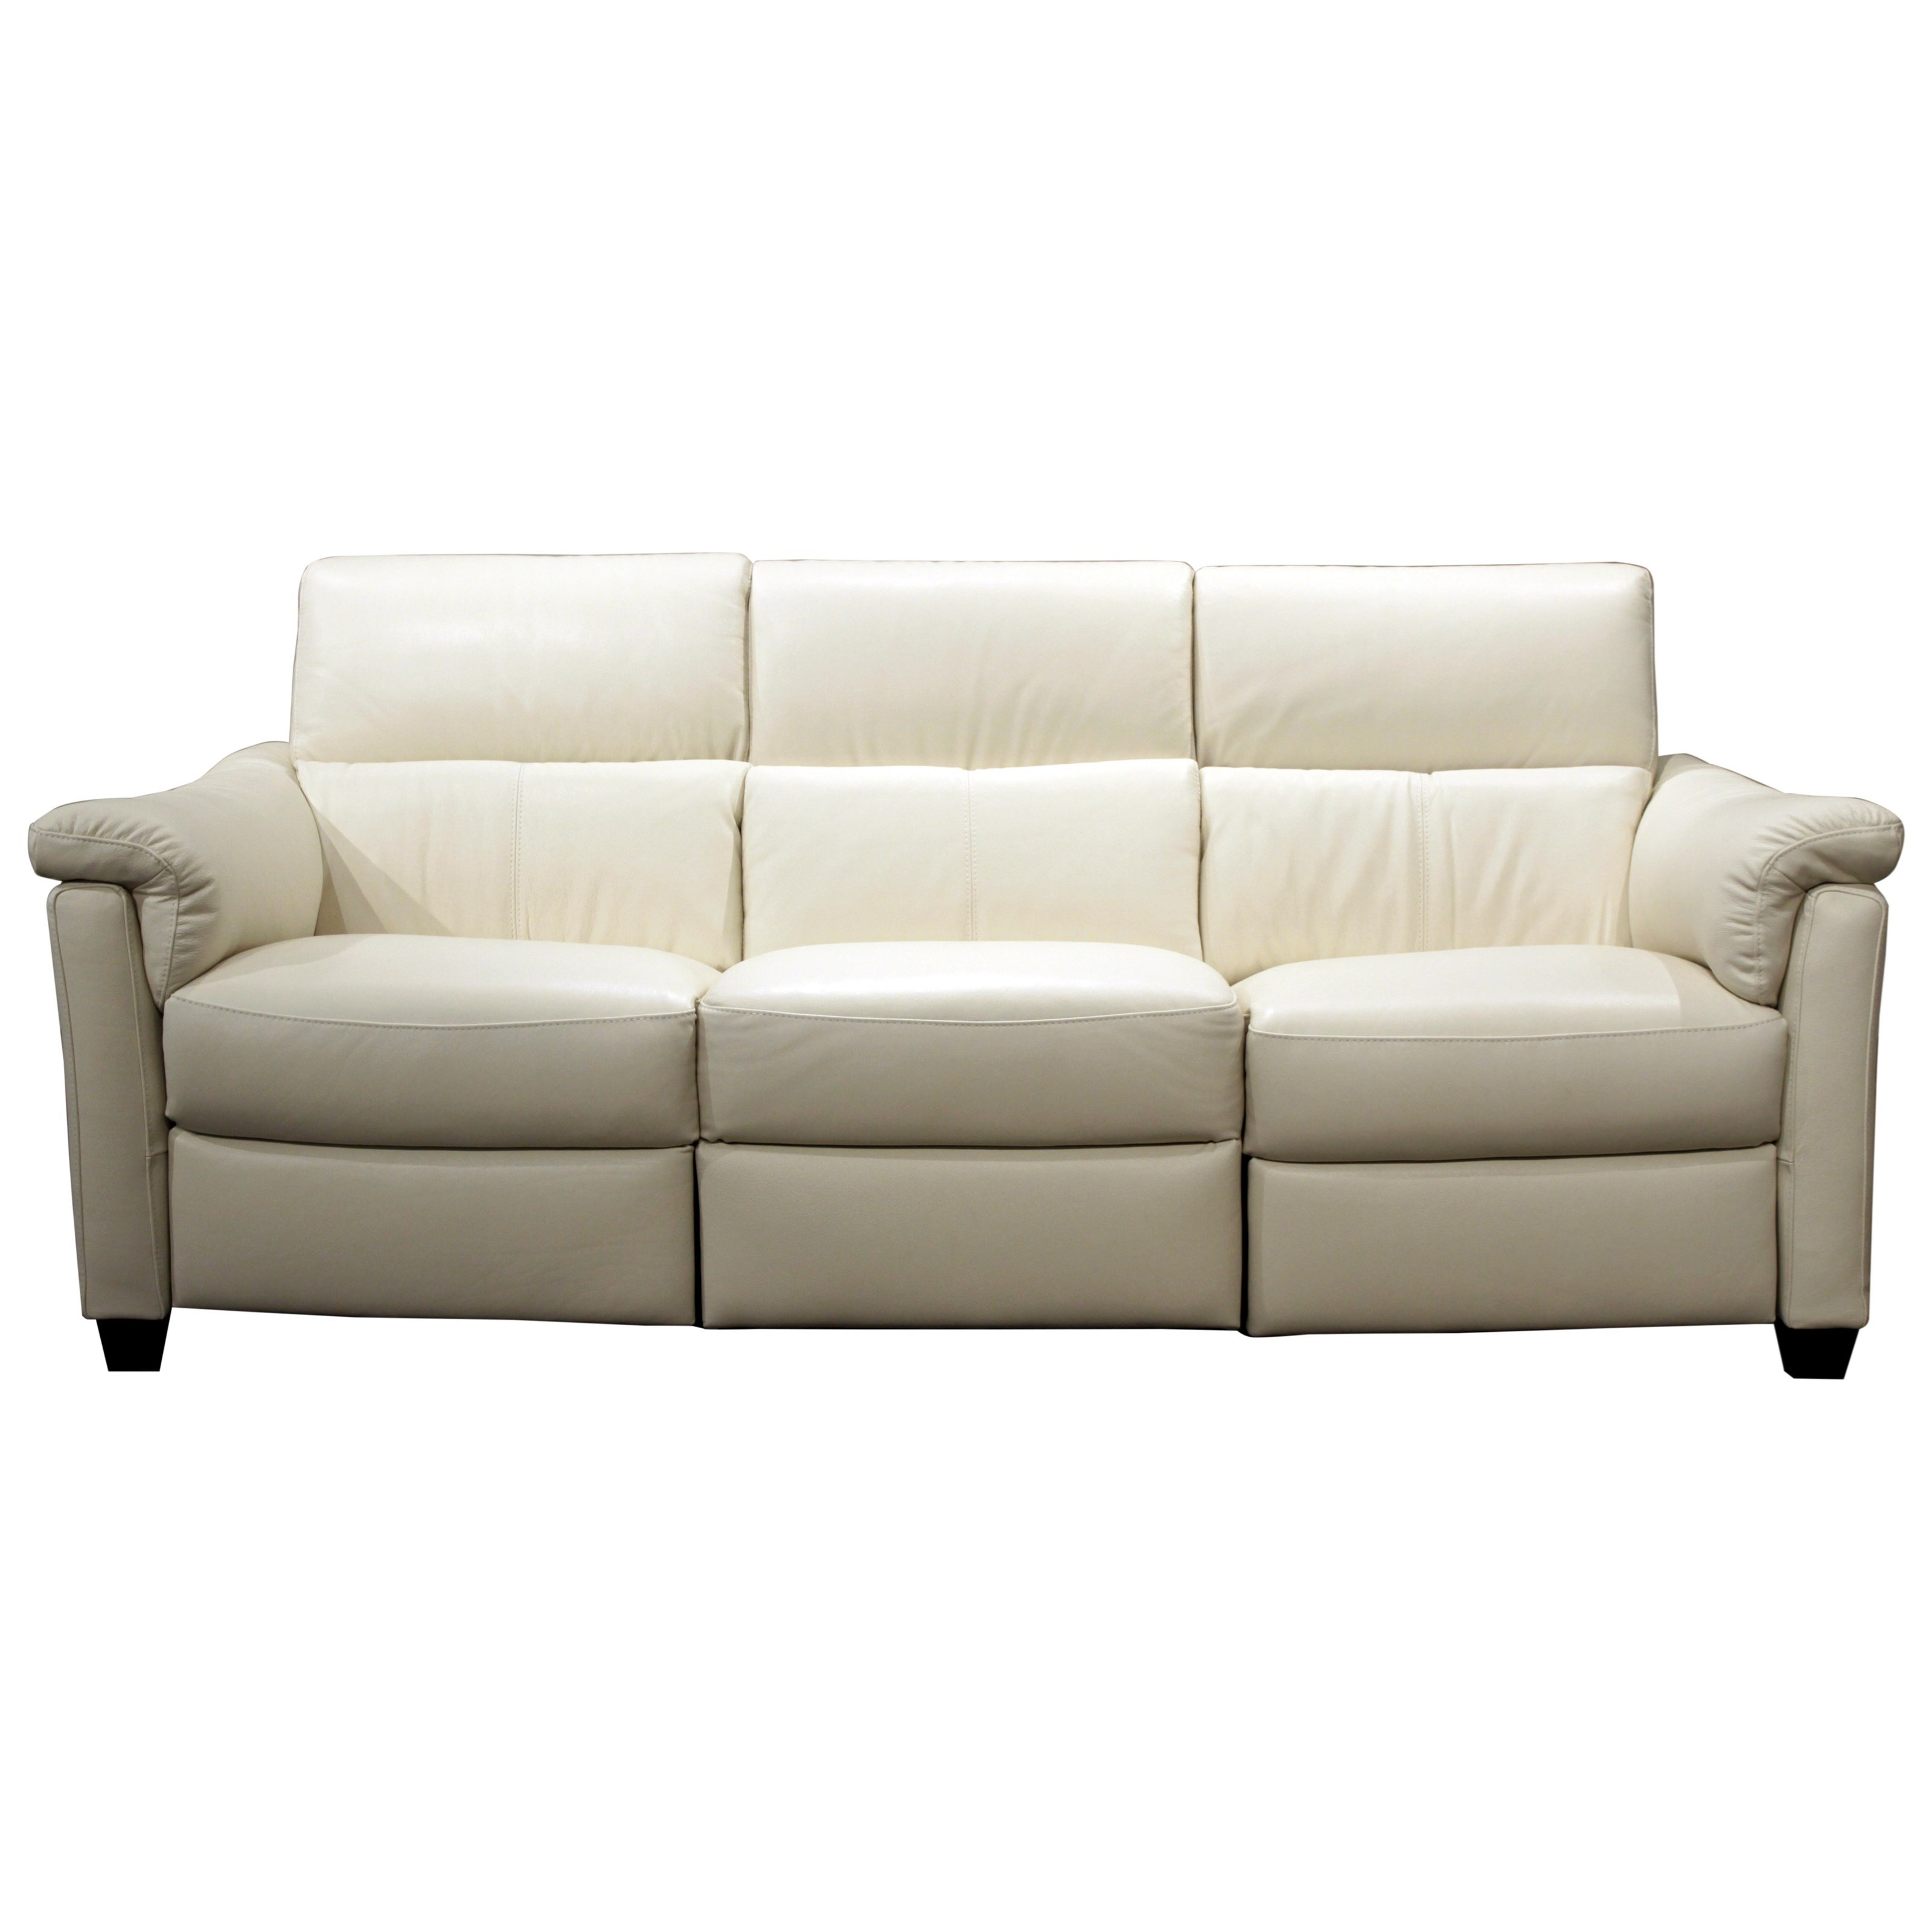 deals on reclining sofas sunbrella slipcover sofa natuzzi motion spectacular amalfi brown